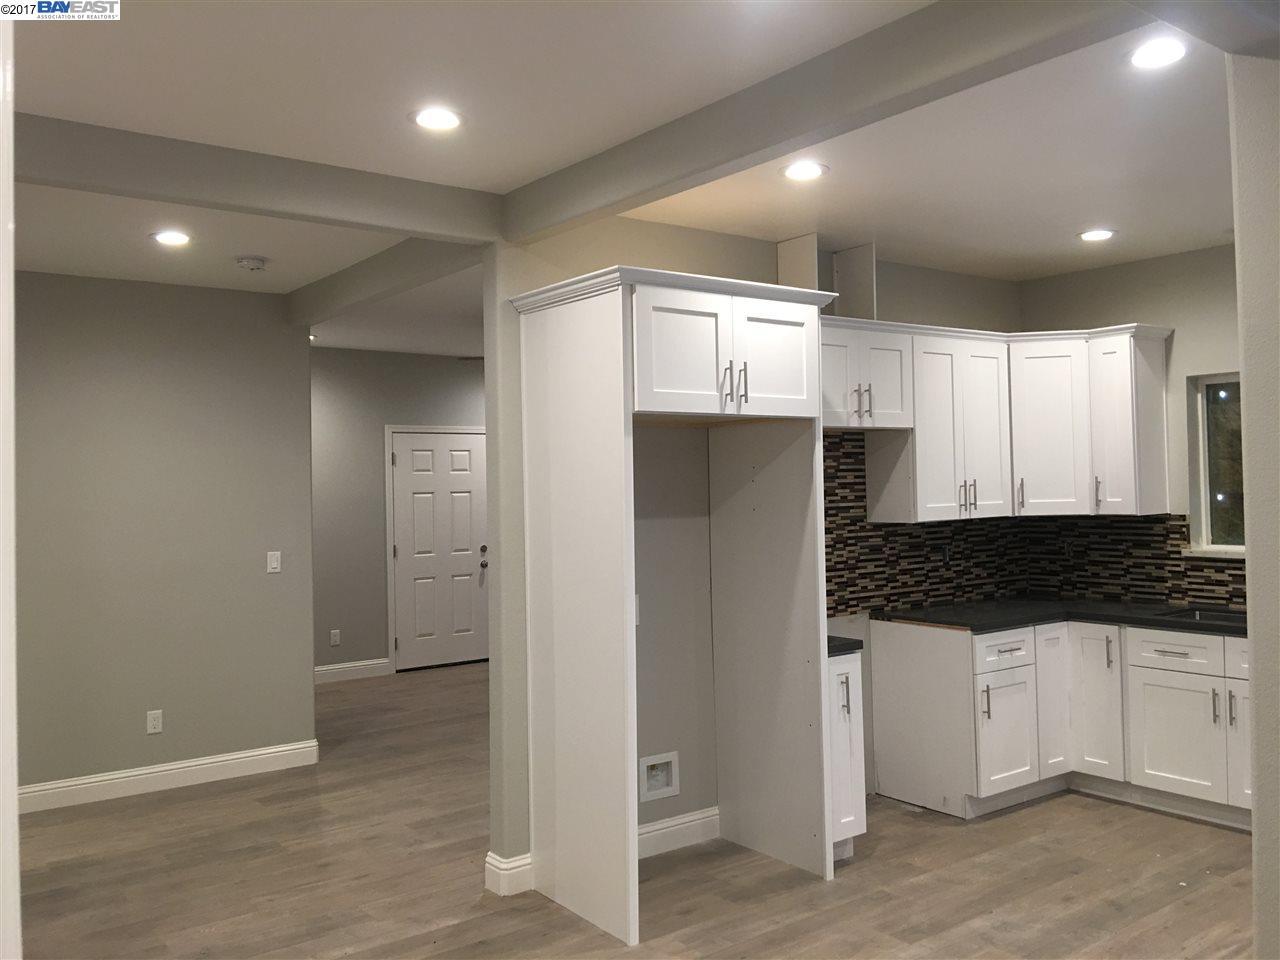 Multi-Family Home for Sale at 517 S Washington Street Modesto, California 95351 United States